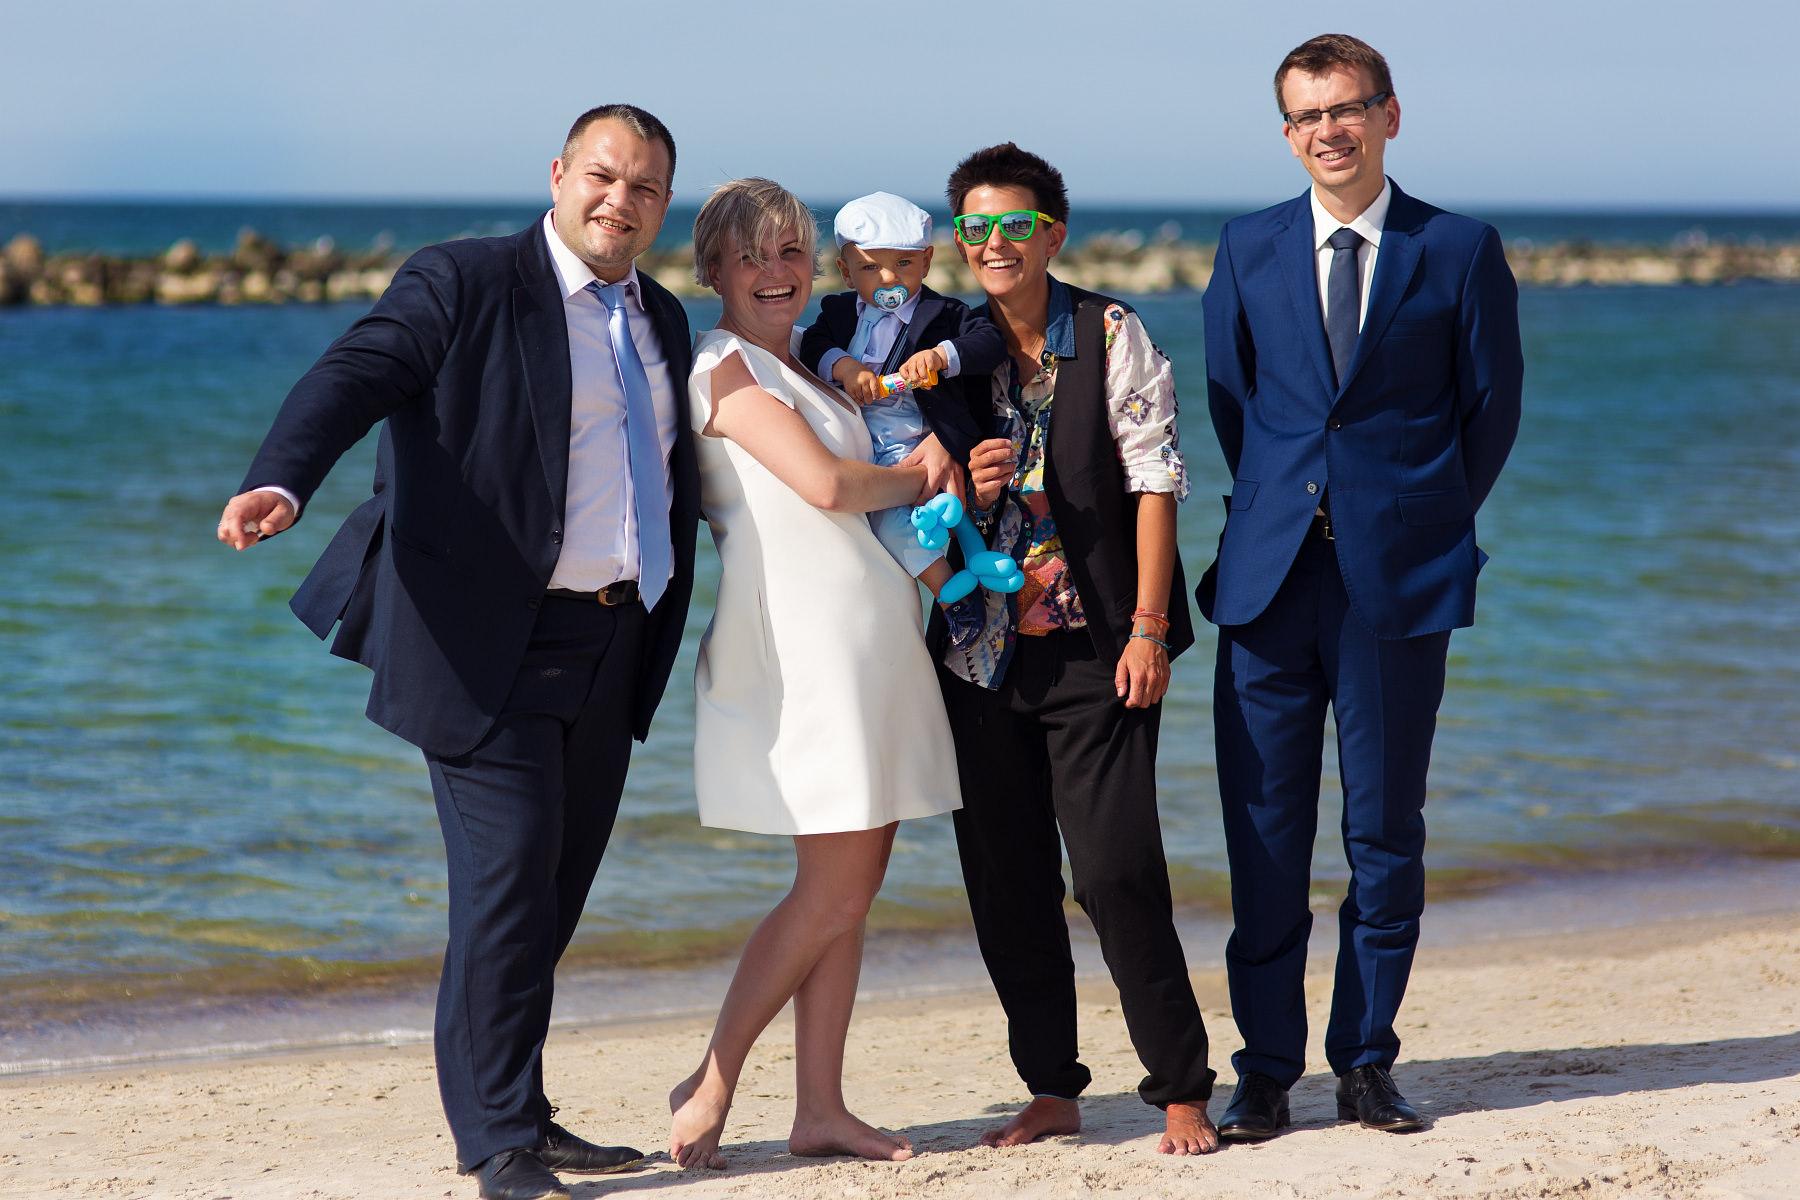 Staś, reportaż z chrztu | Darłowo (Darłówek)